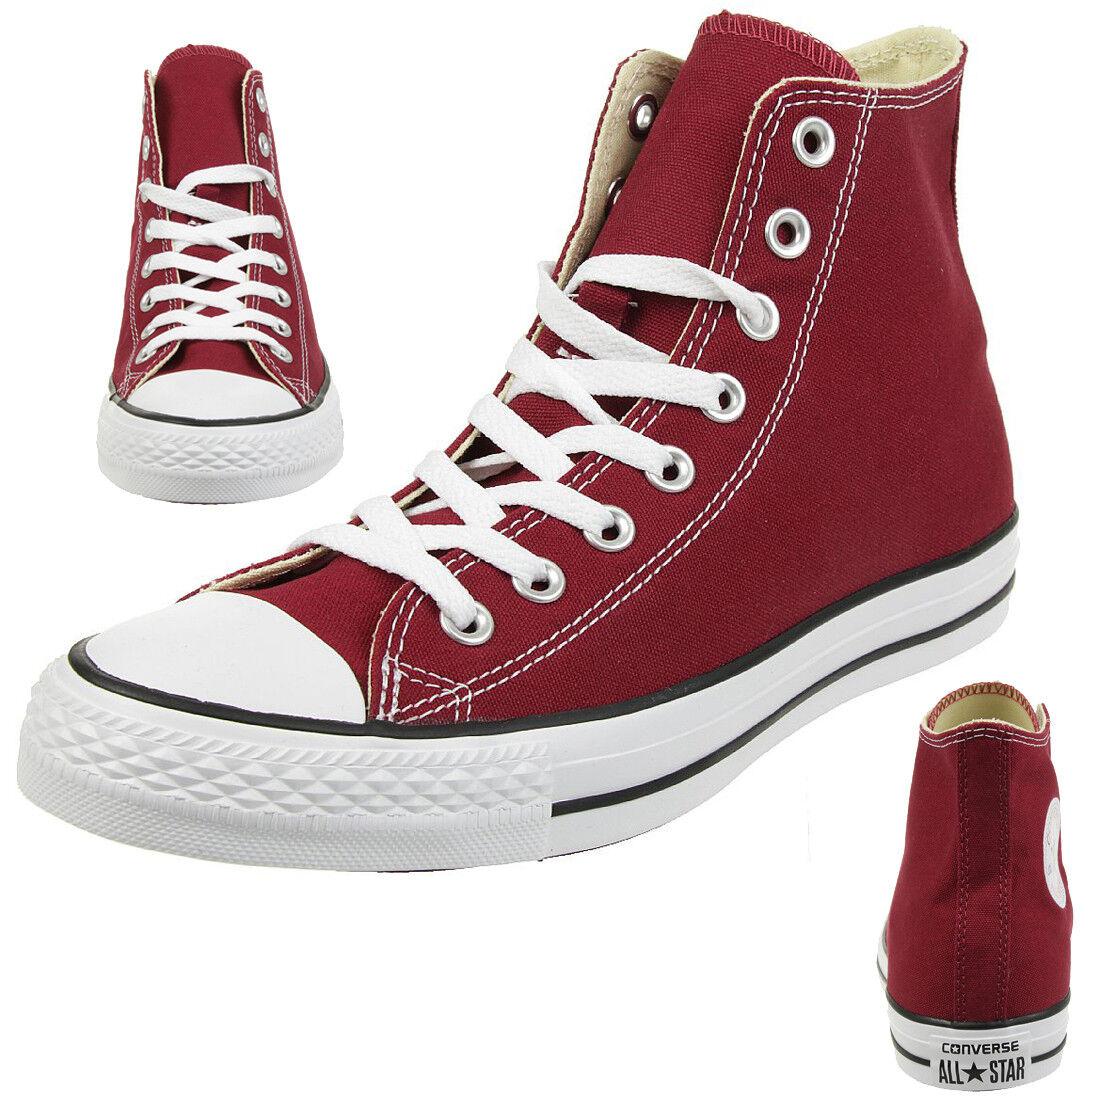 Converse C Taylor All Star HI Chuck Schuhe Sneaker canvas Maroon M9613C